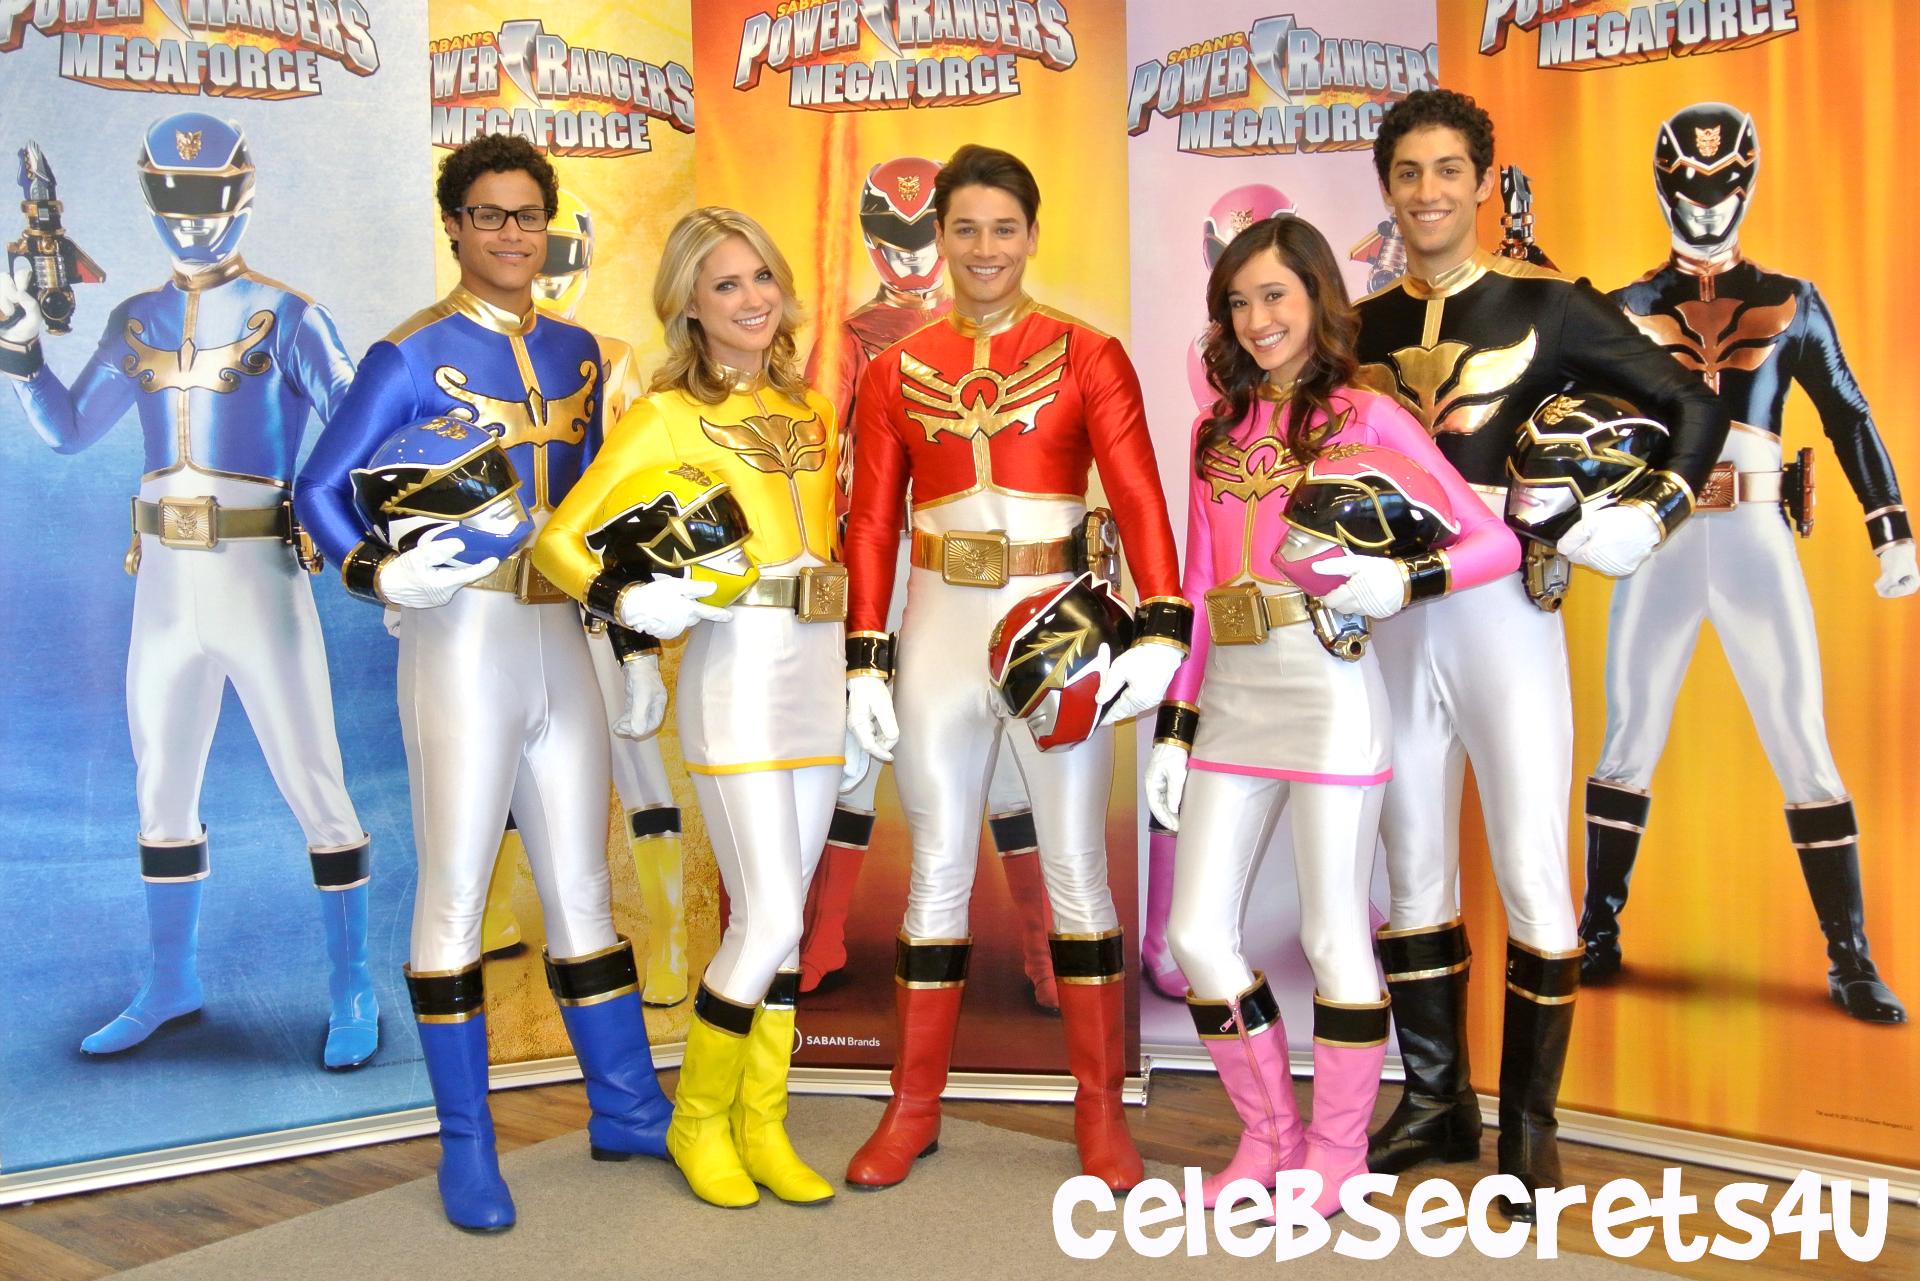 Power Rangers Megaforce Action Adventure Children Superhero